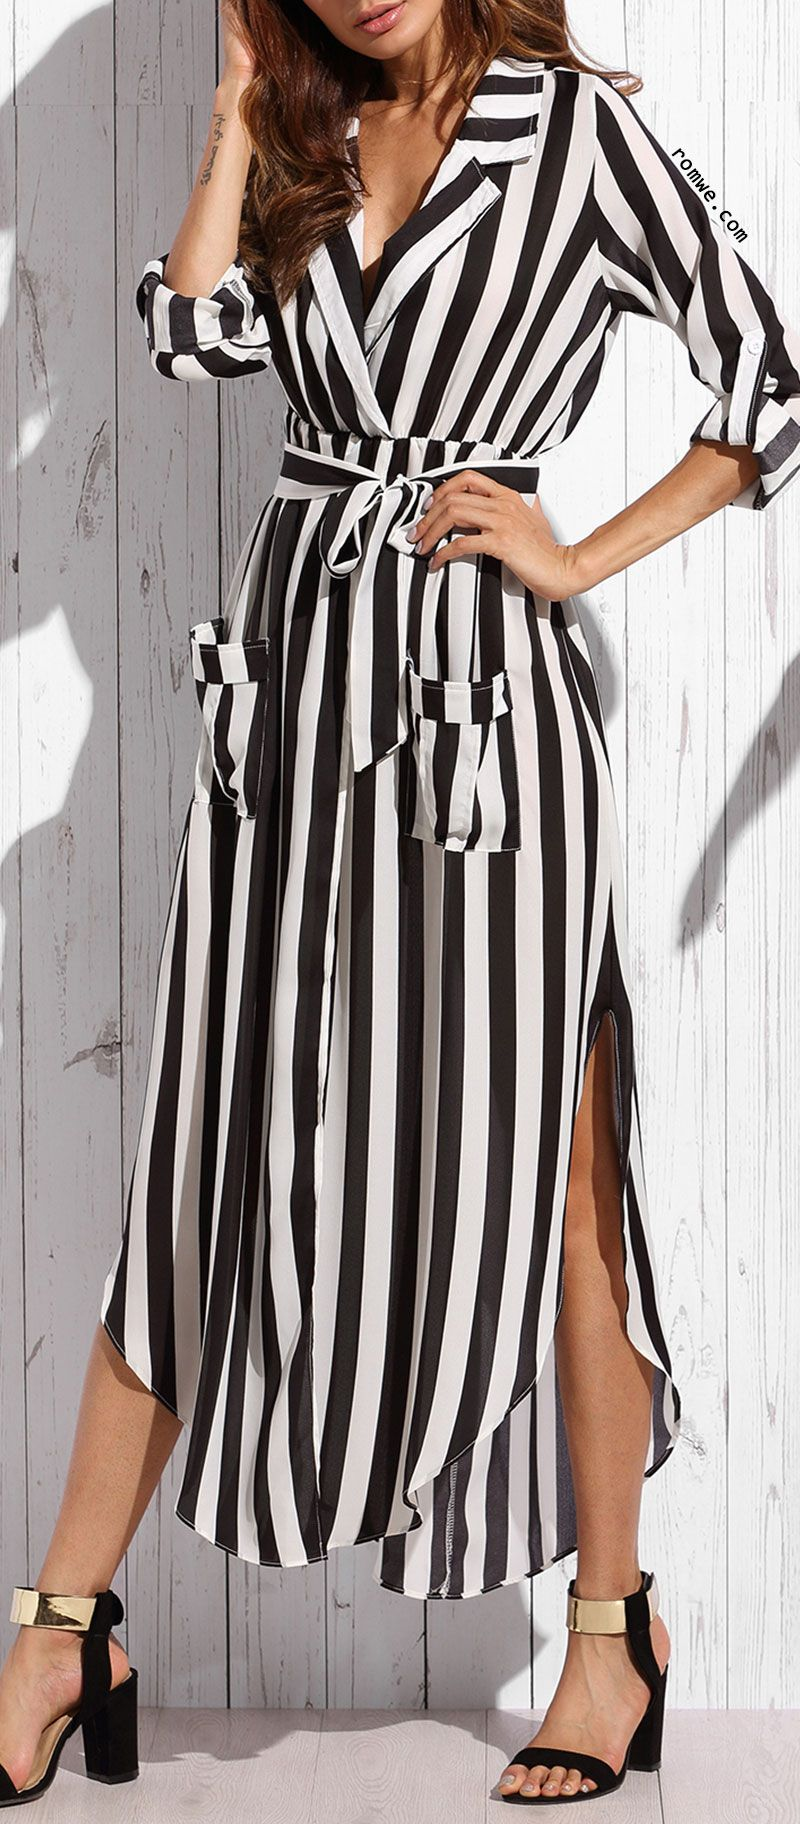 Contrast Vertical Striped Notch Lapel Belted Shirt Dress Belted Shirt Dress Shirt Dress Striped Maxi Dresses [ 1824 x 800 Pixel ]